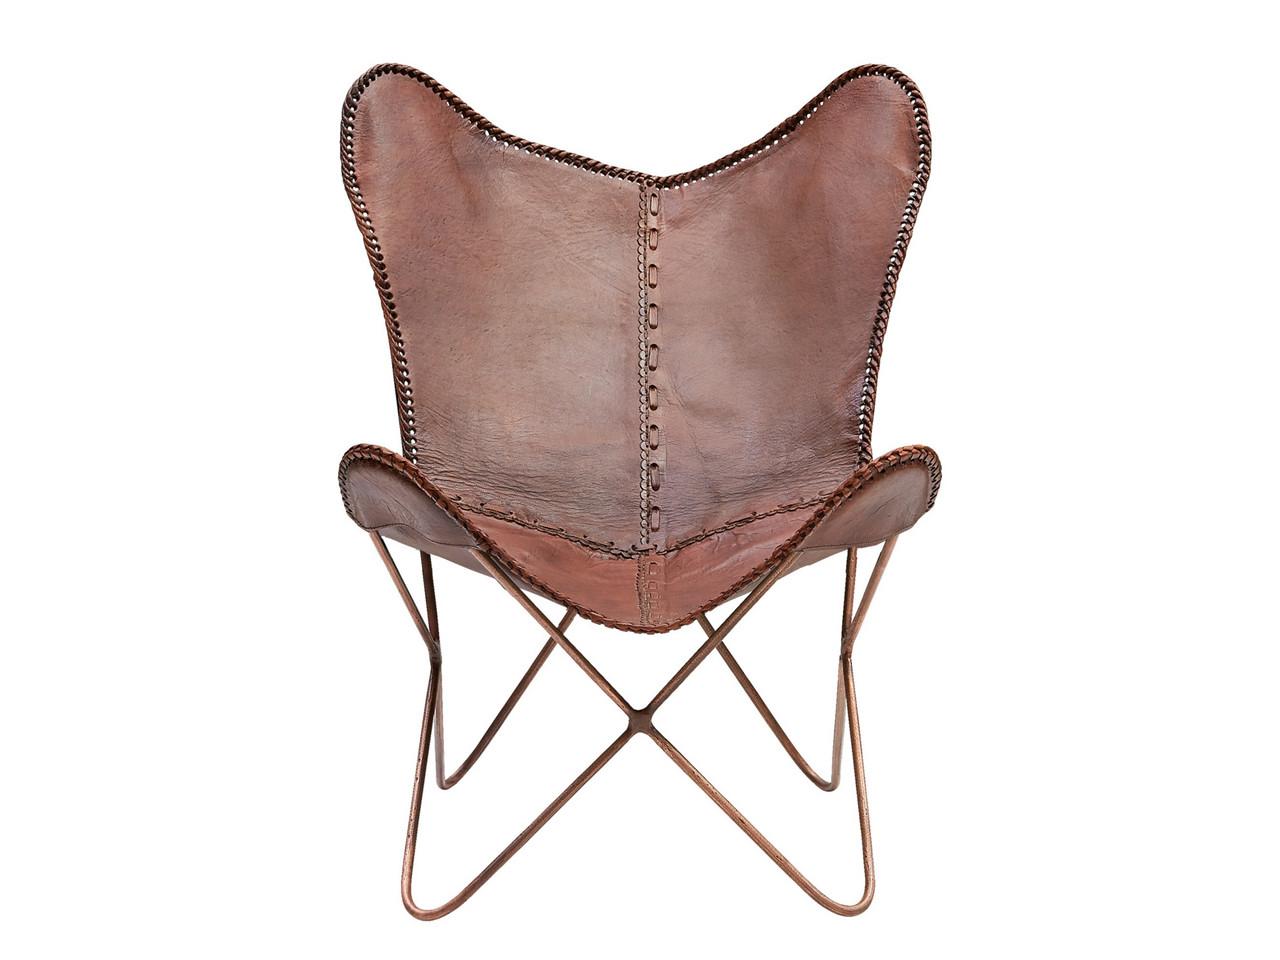 stol læder Melissa læder stol stol læder